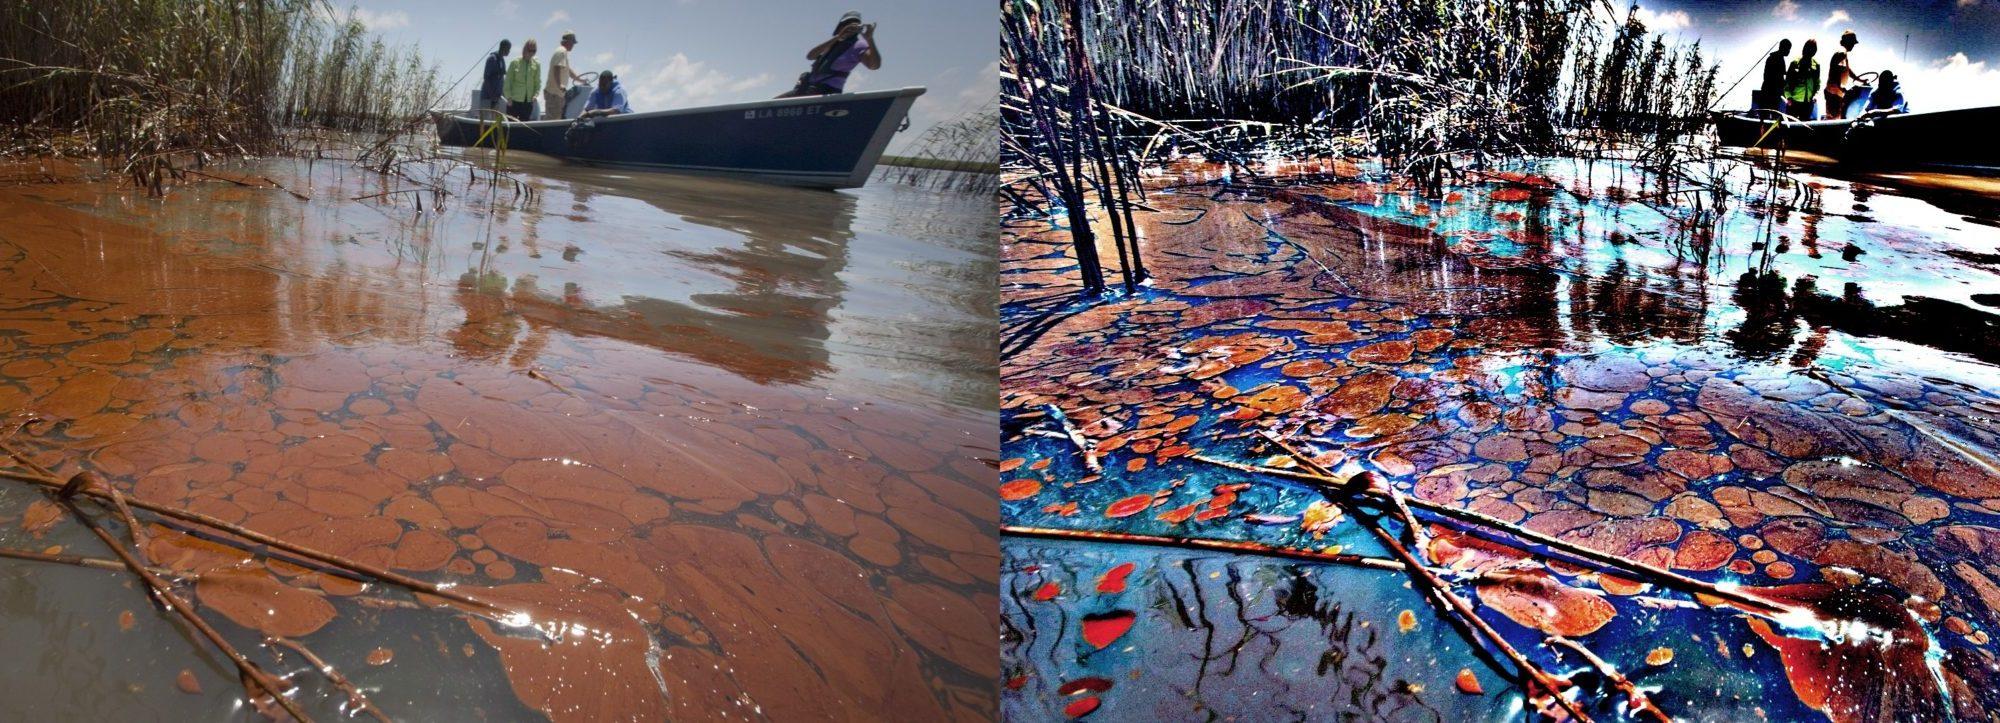 ERV scan comparison-remote-subsurface-sensing-scan-of-oil-spill